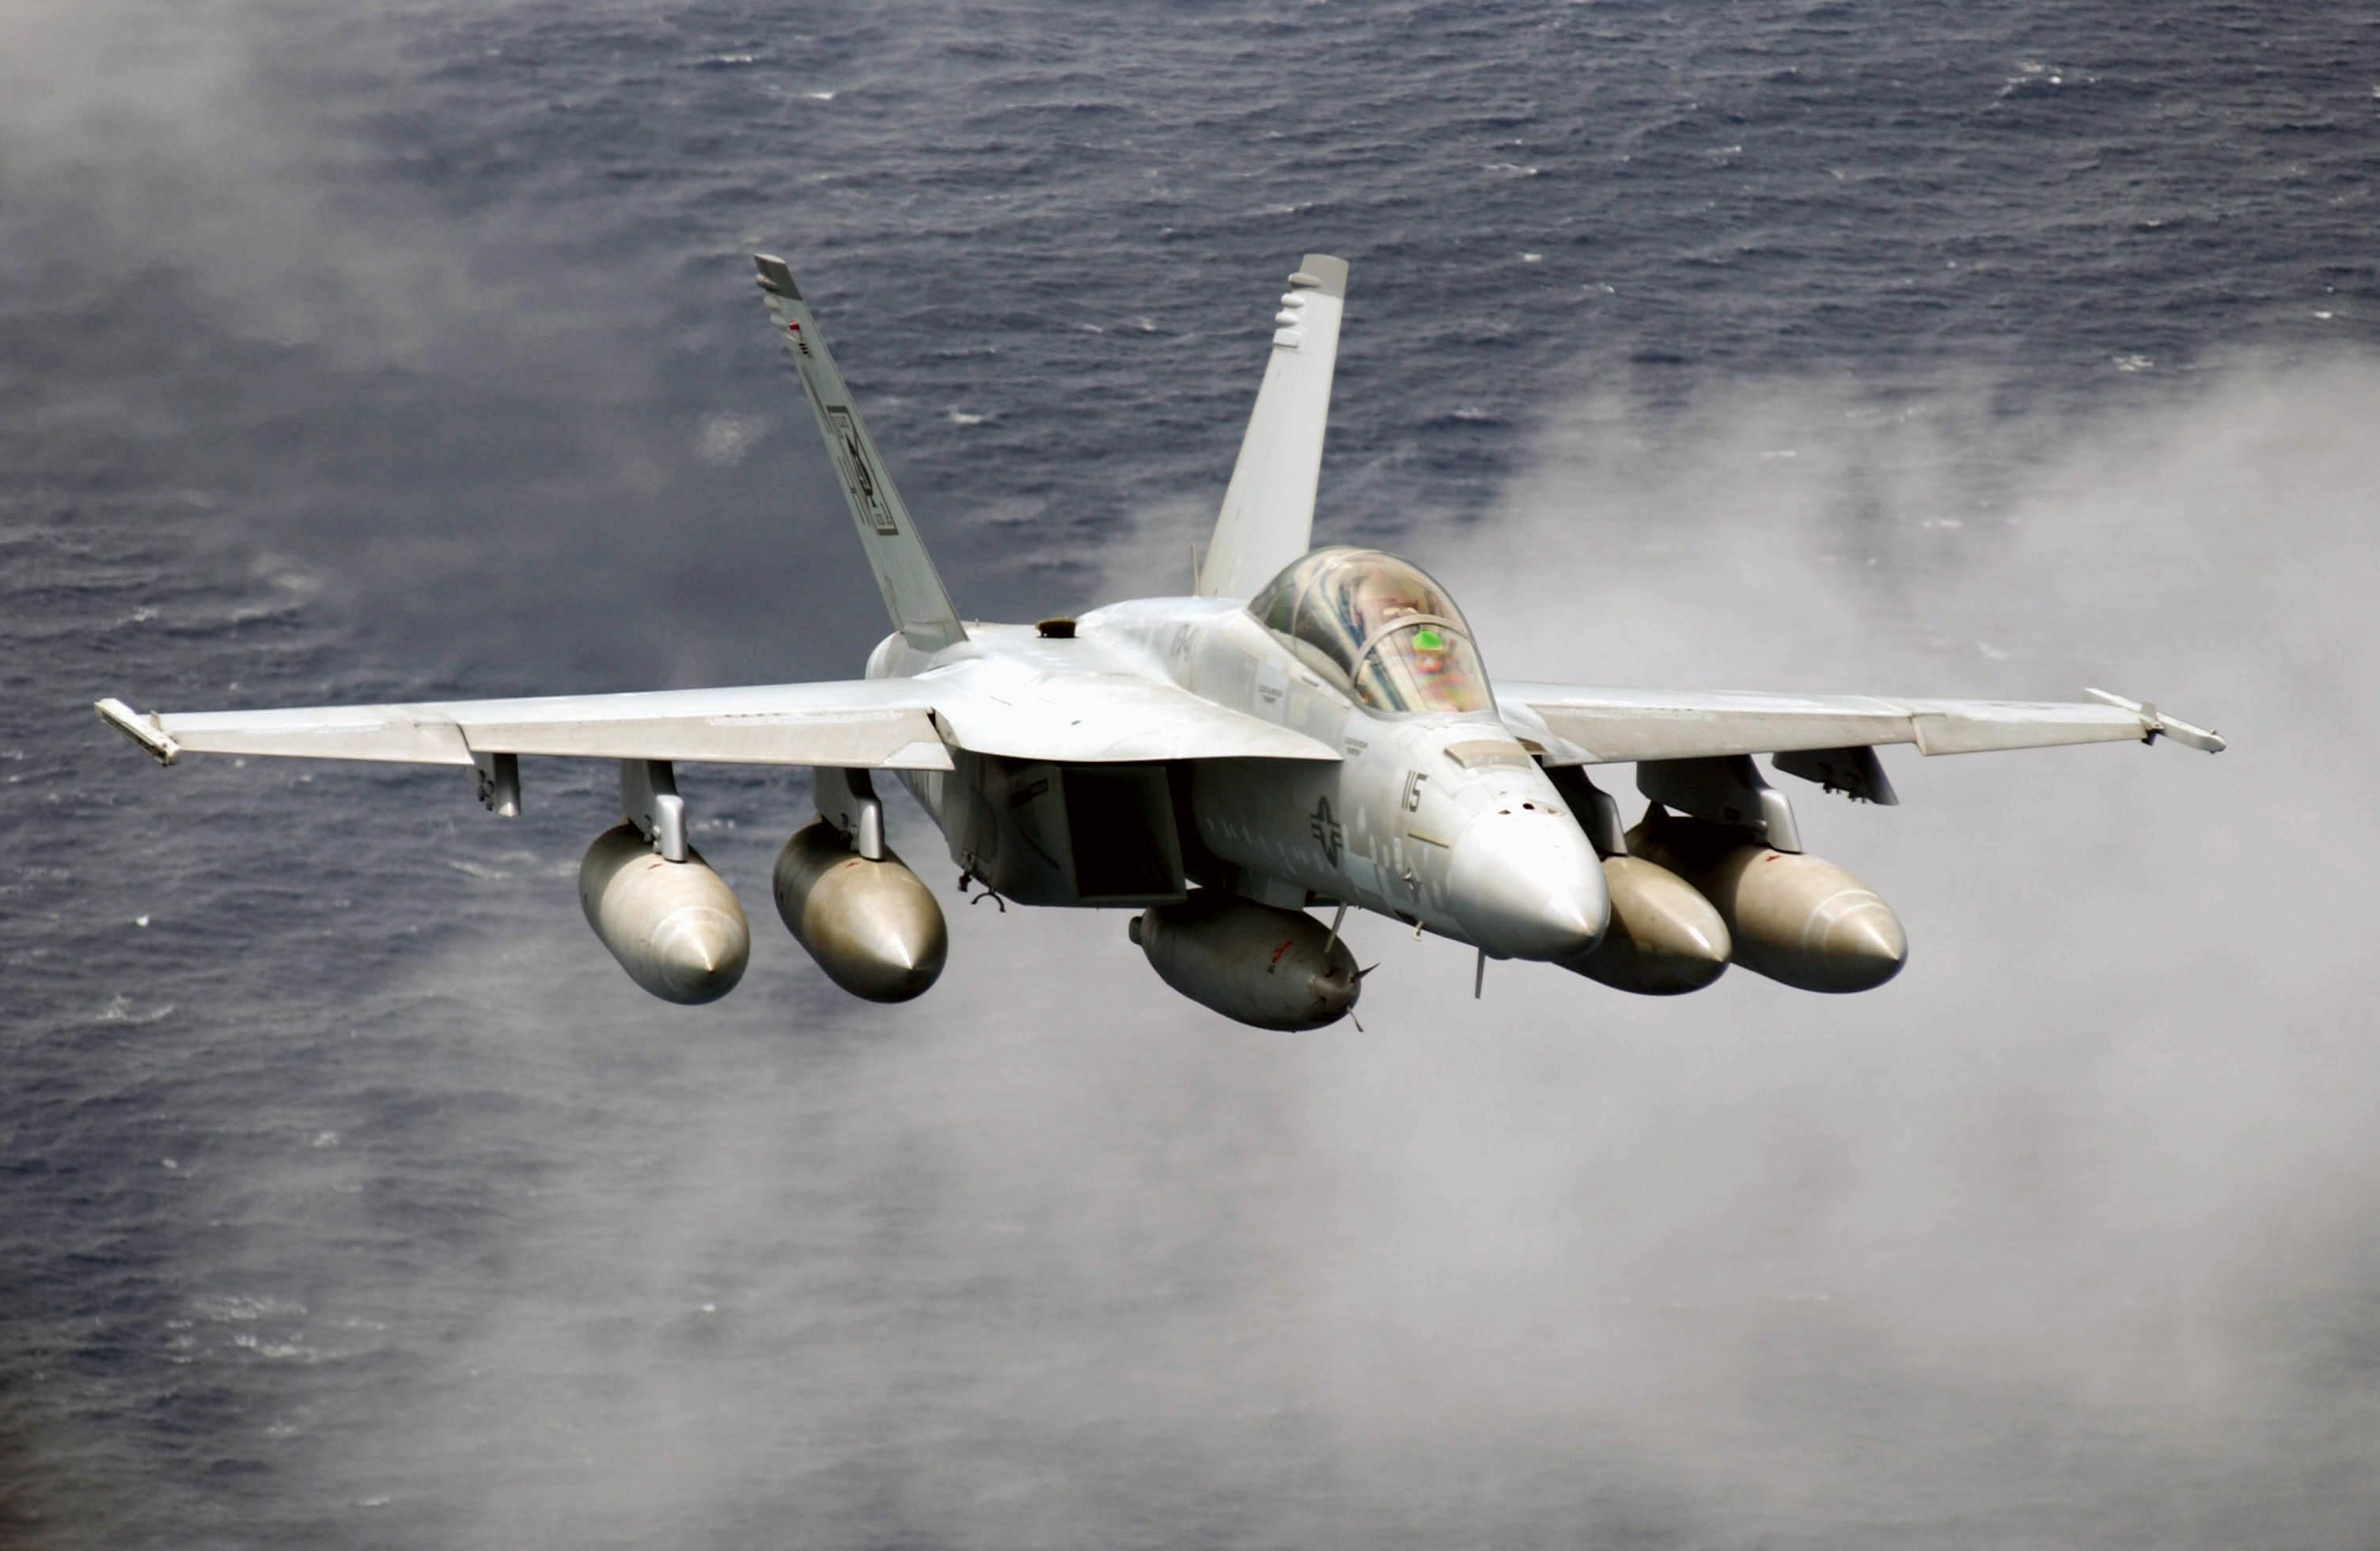 F A 18 Hornet Hd Wallpaper Background Image 3008x1960